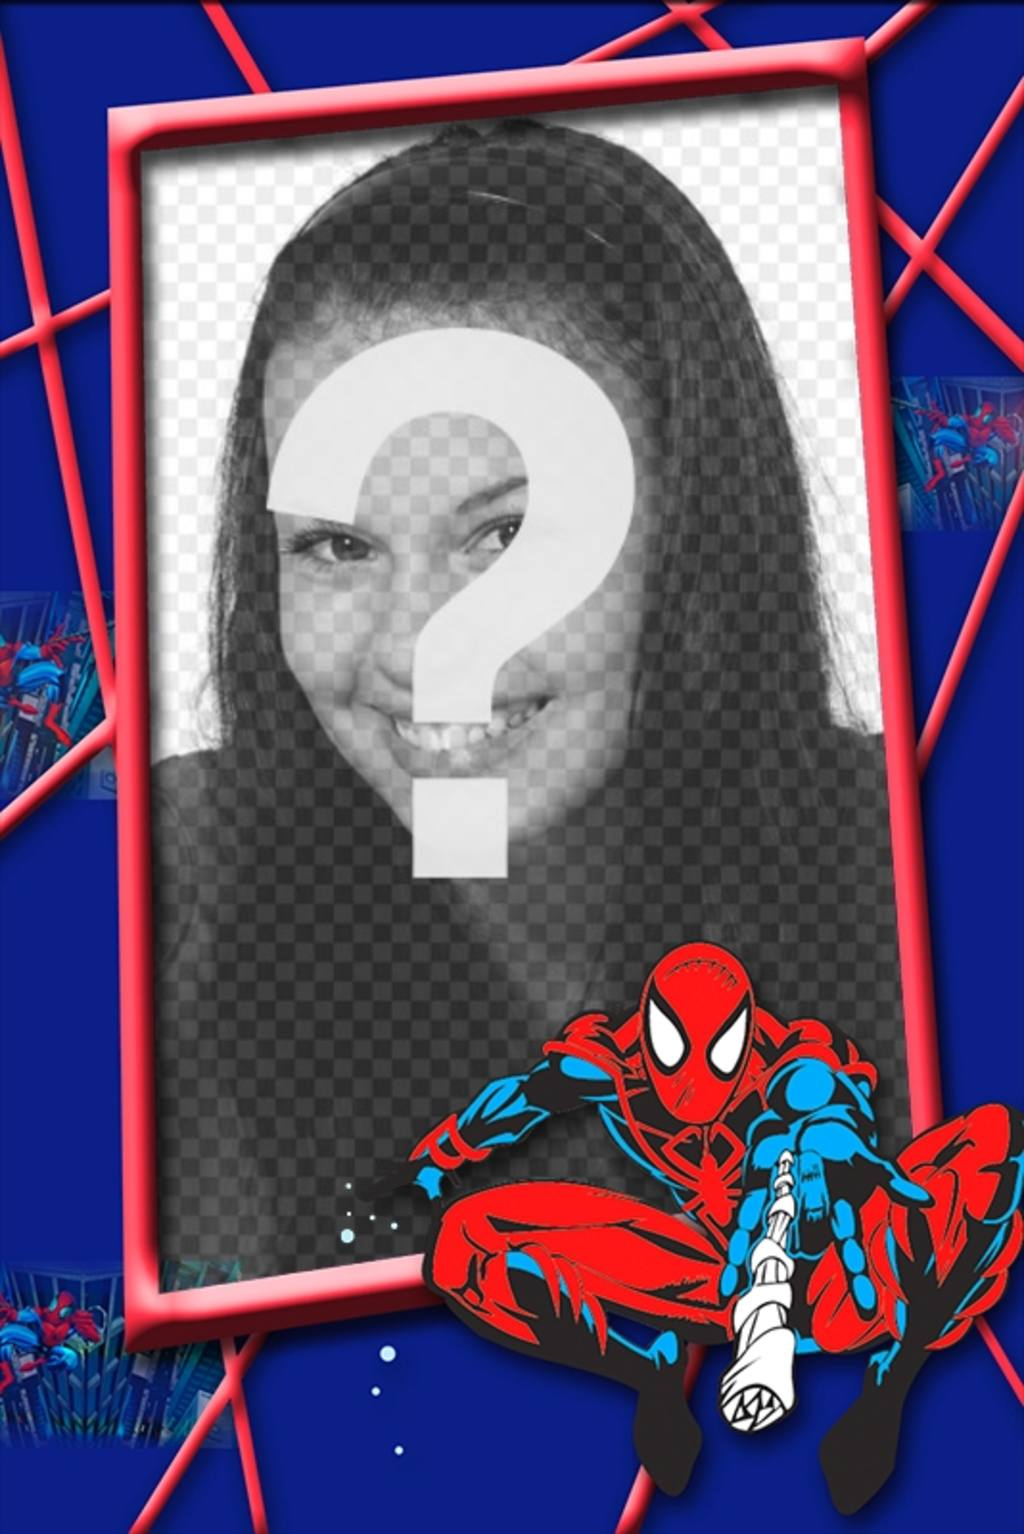 marco fotos infantil spiderman rojos azules telarana